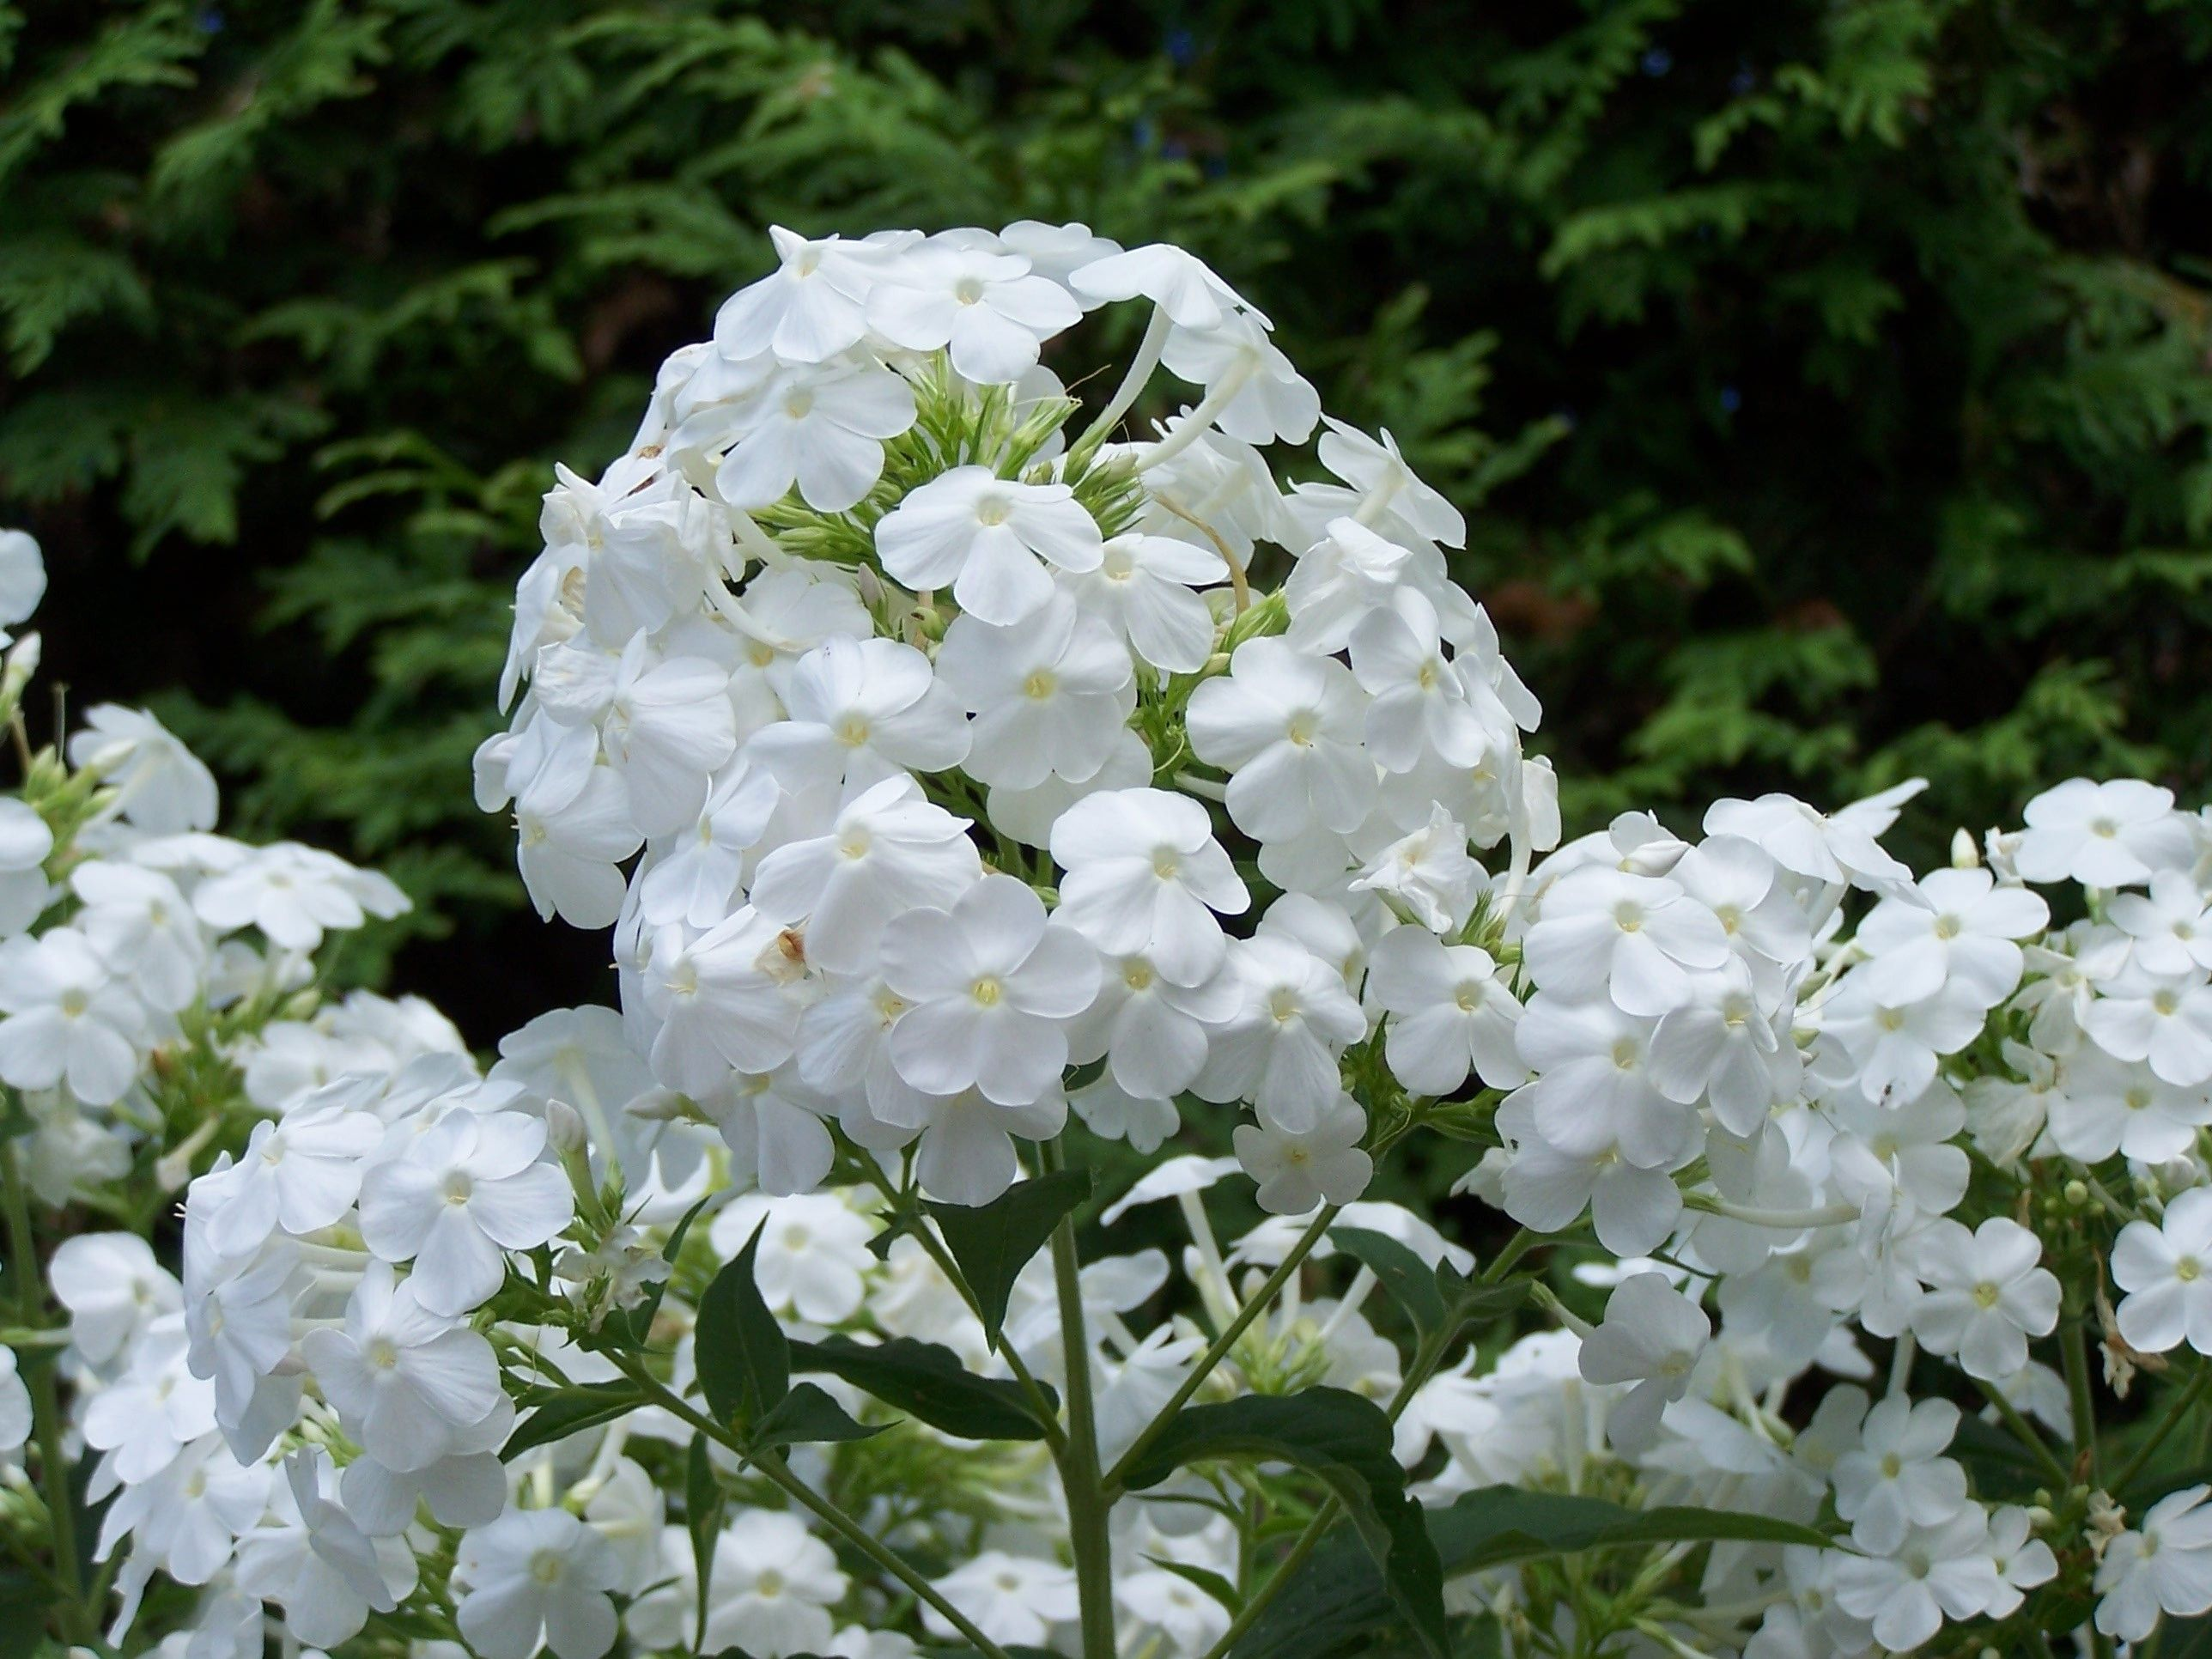 White Phlox Perennial Flowers